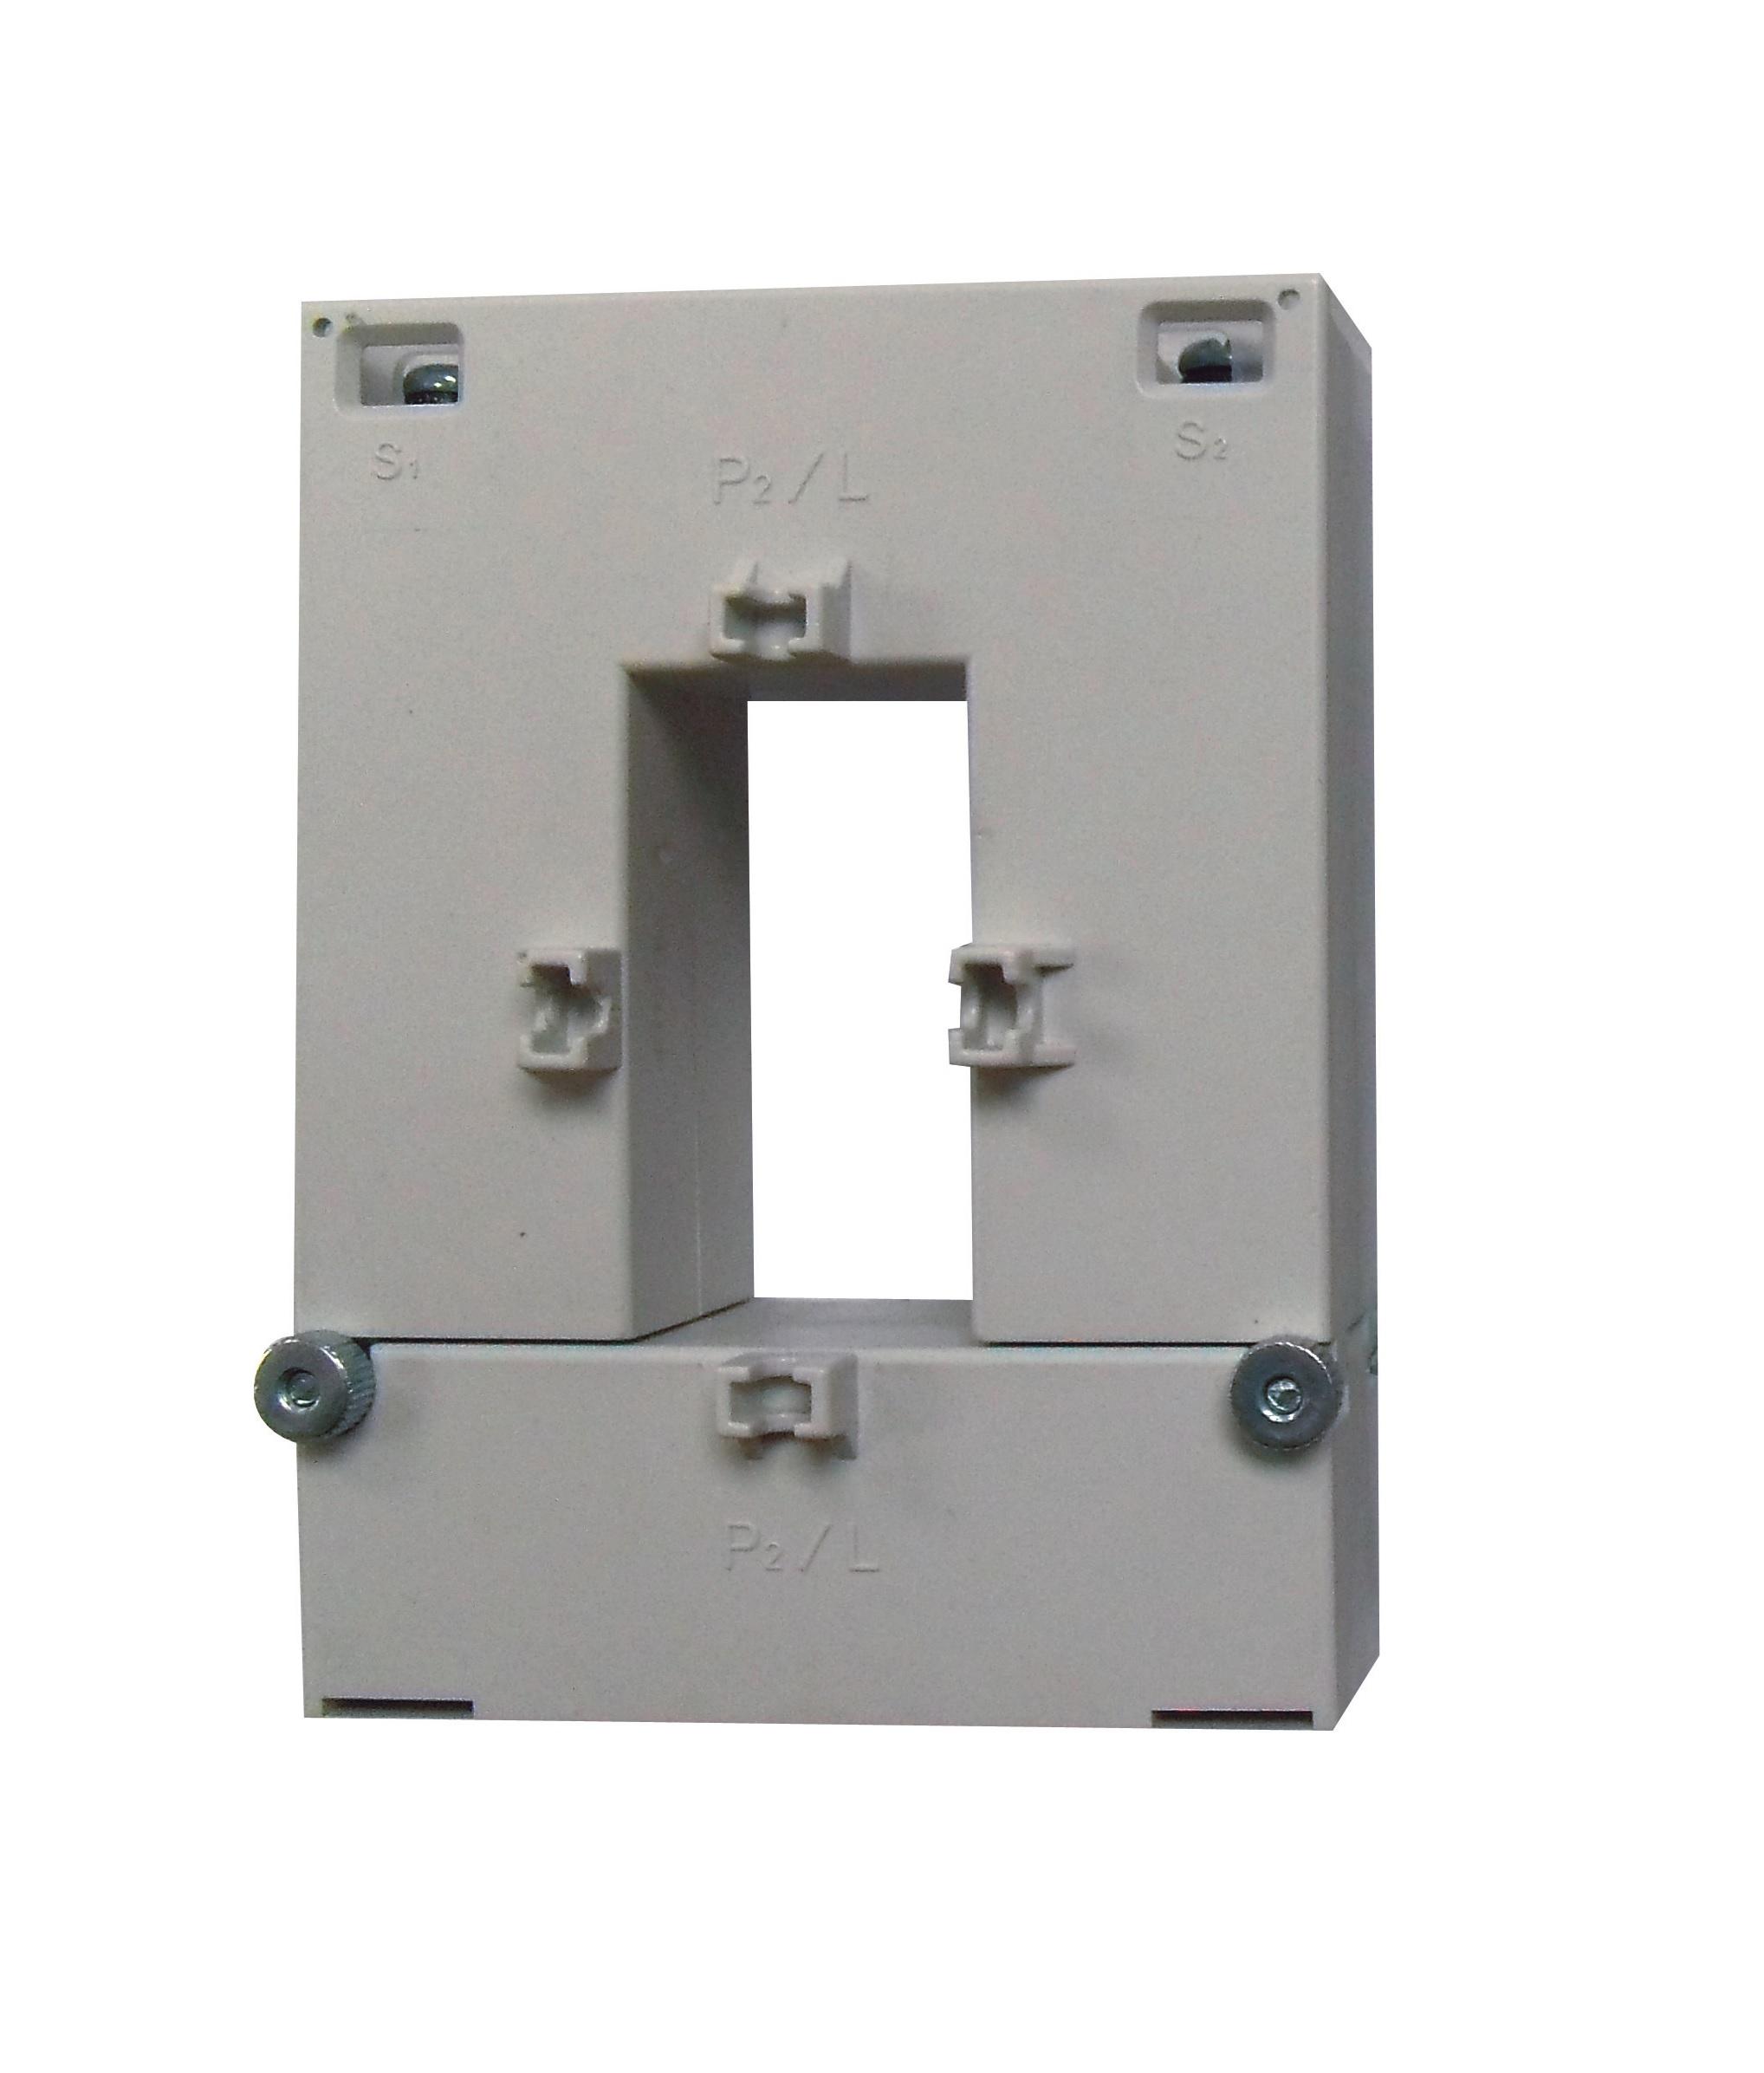 1 Stk Teilbare Wandler, 400/5A, 60x20mm, Klasse 0,5 MG968400--